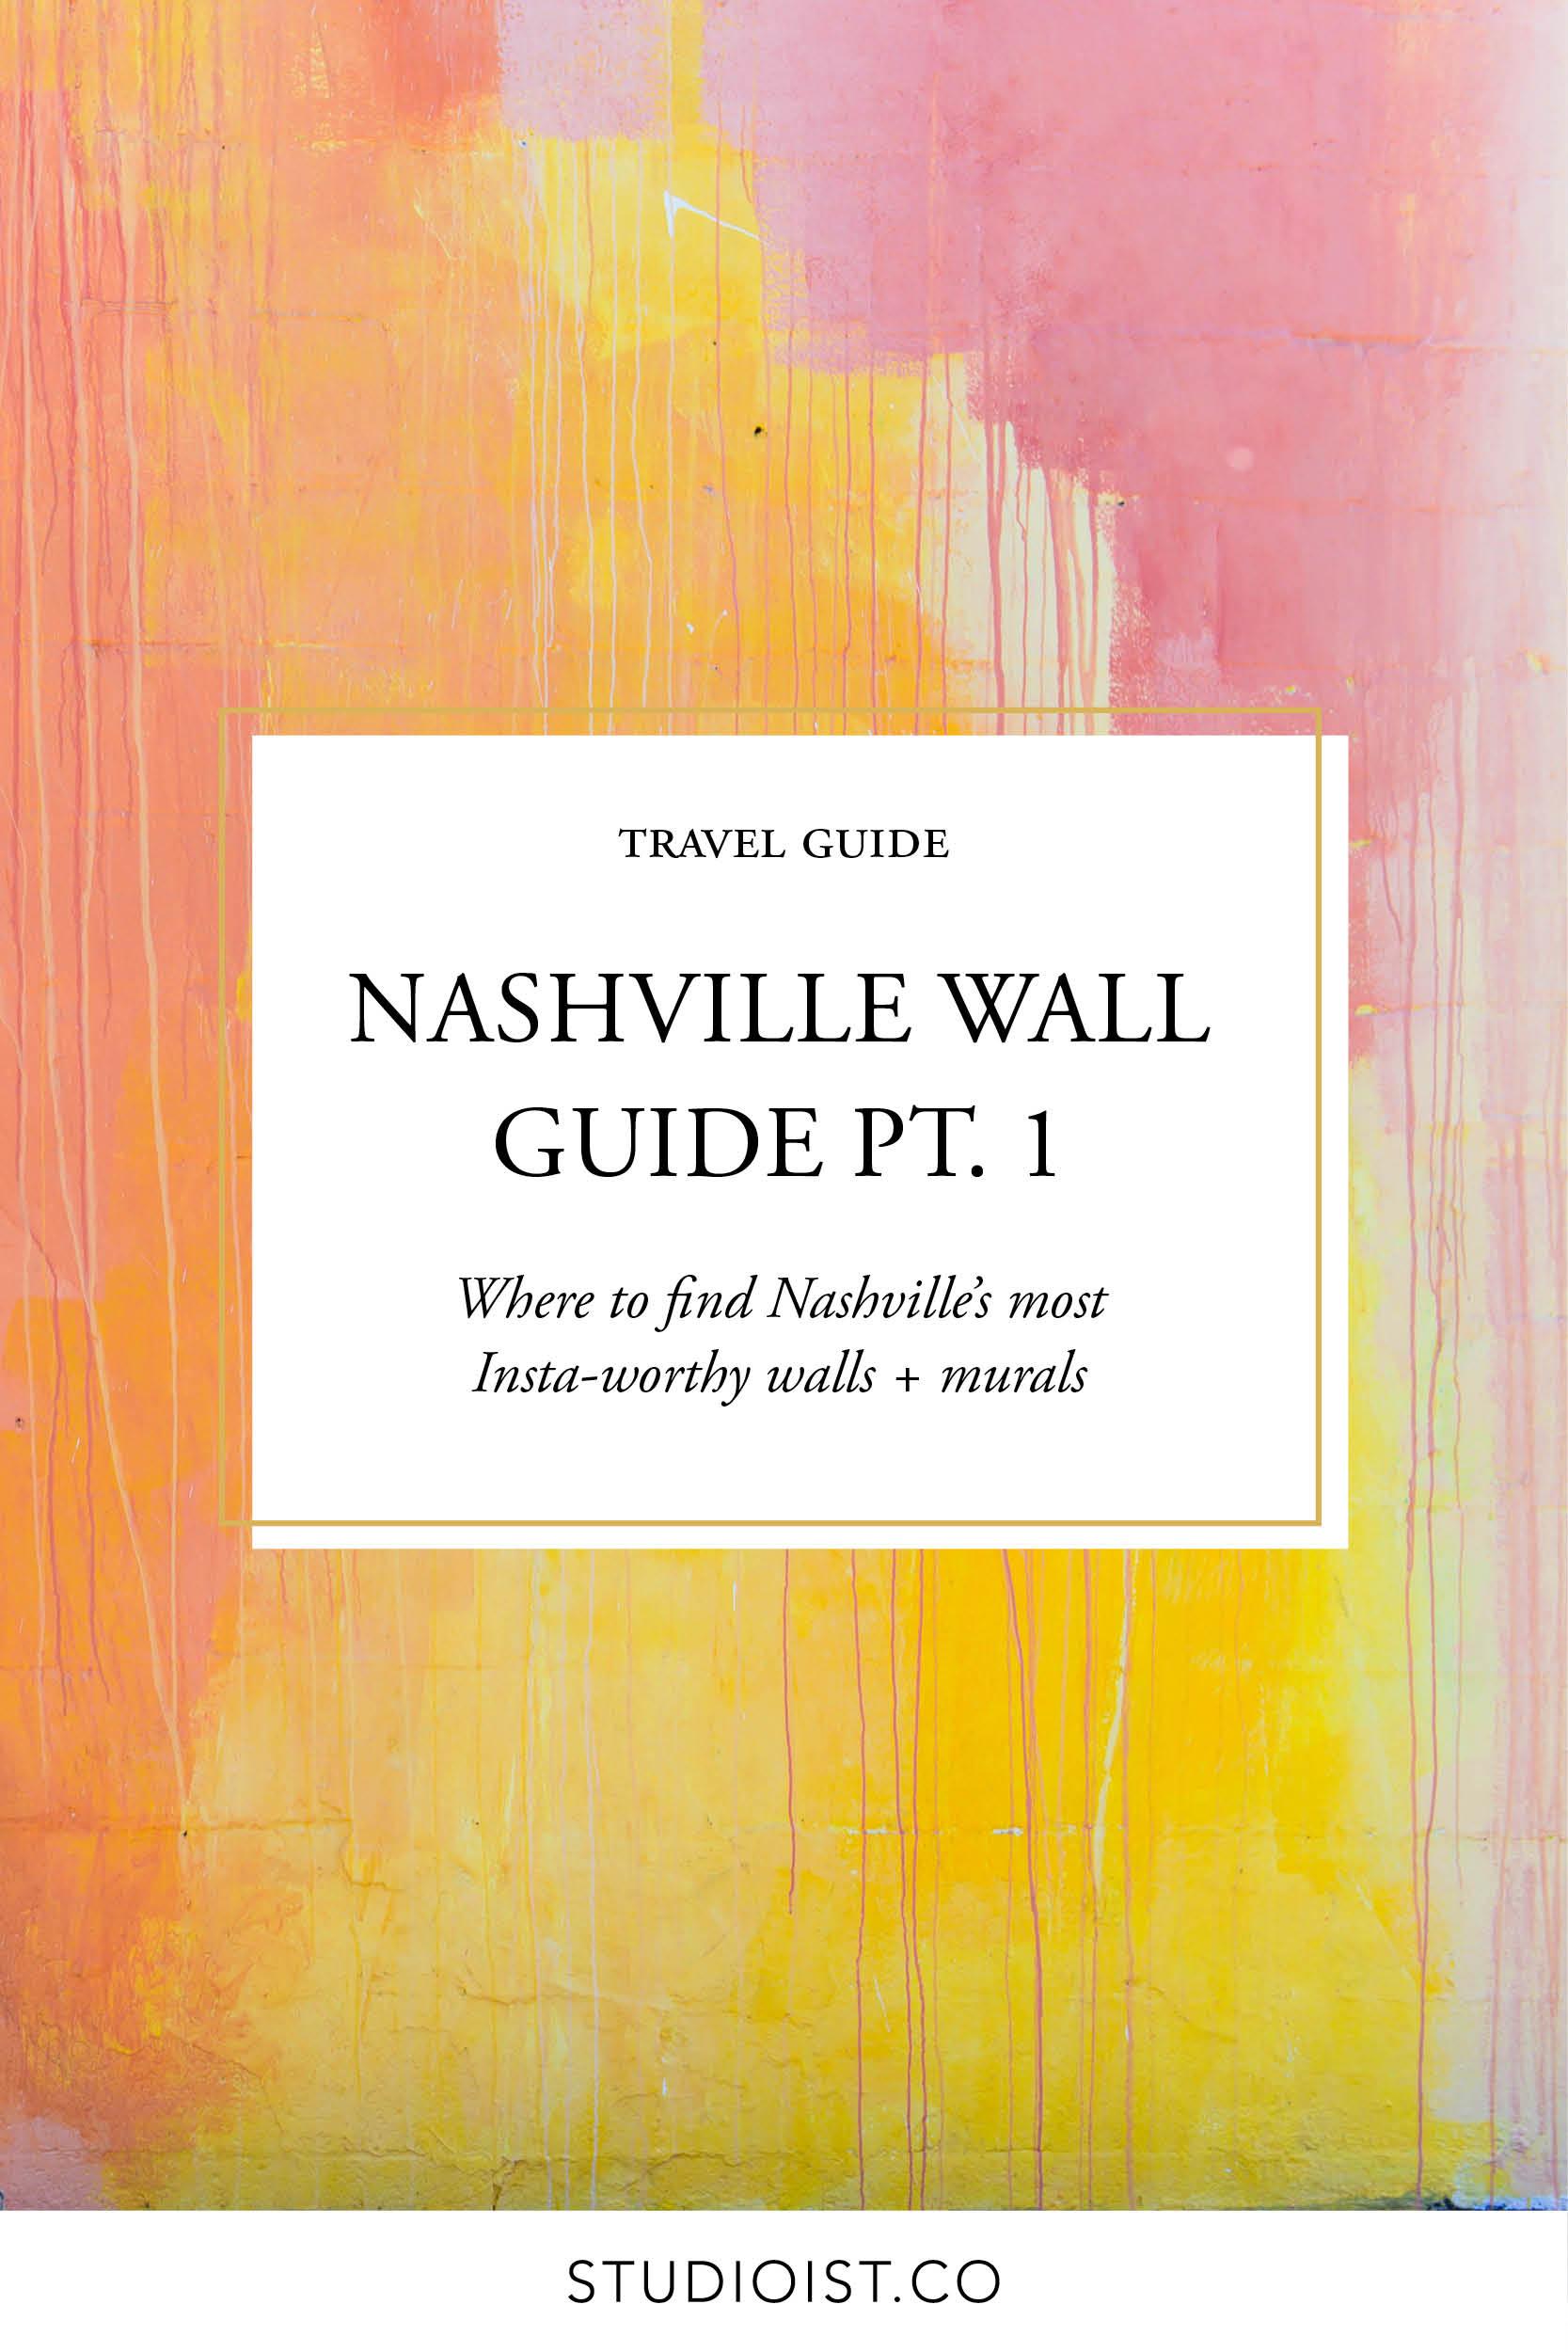 Studioist_Pinterest Design Travel_NashvilleWalls pt1.jpg